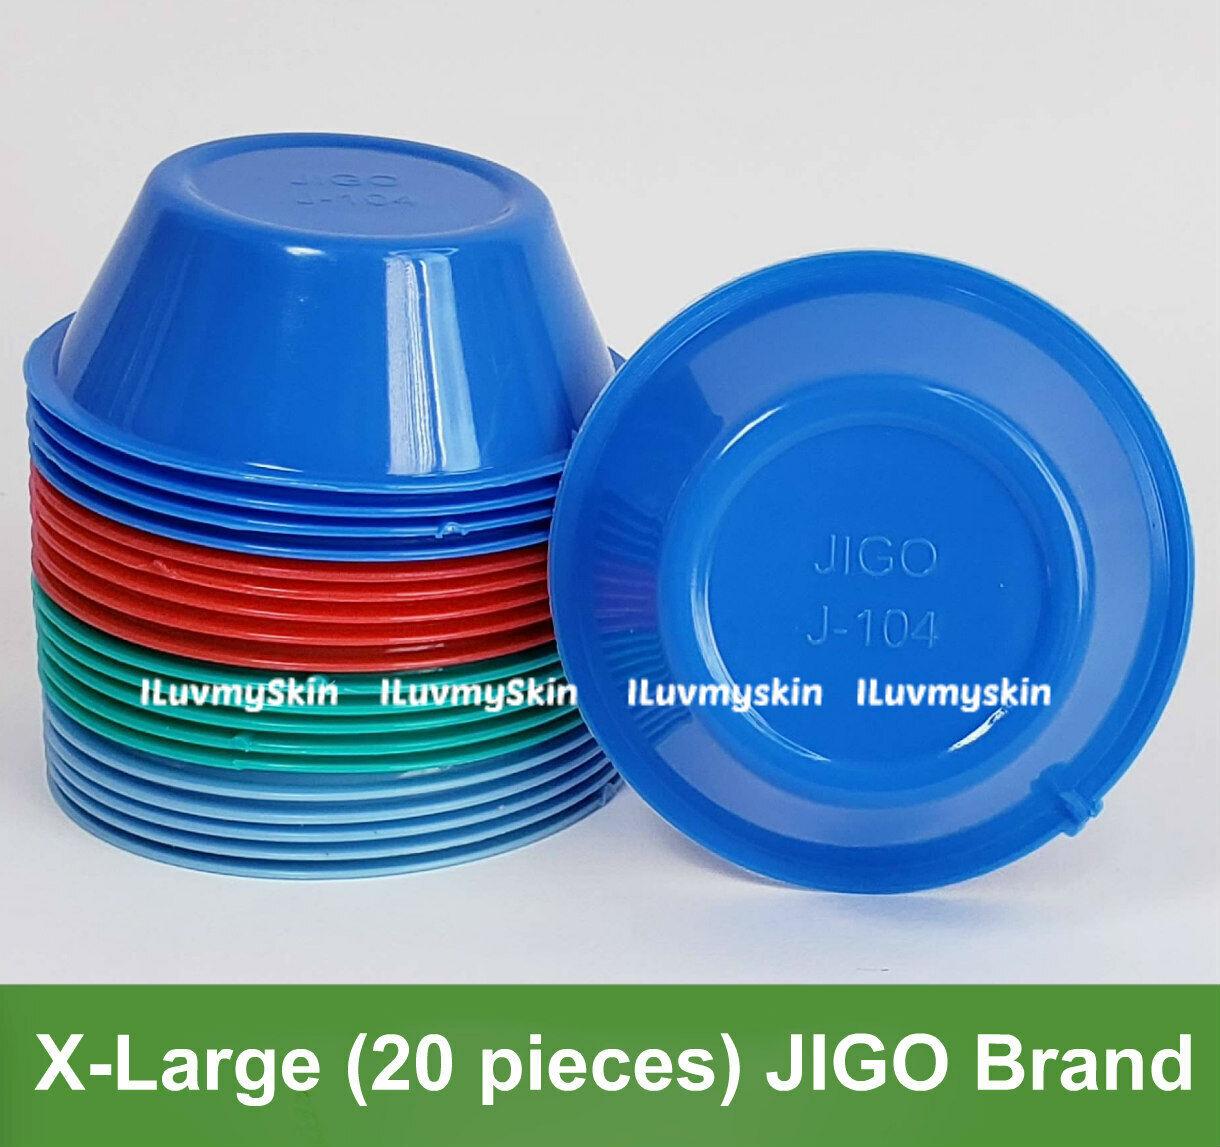 X-Large (20 pieces) JIGO Brand